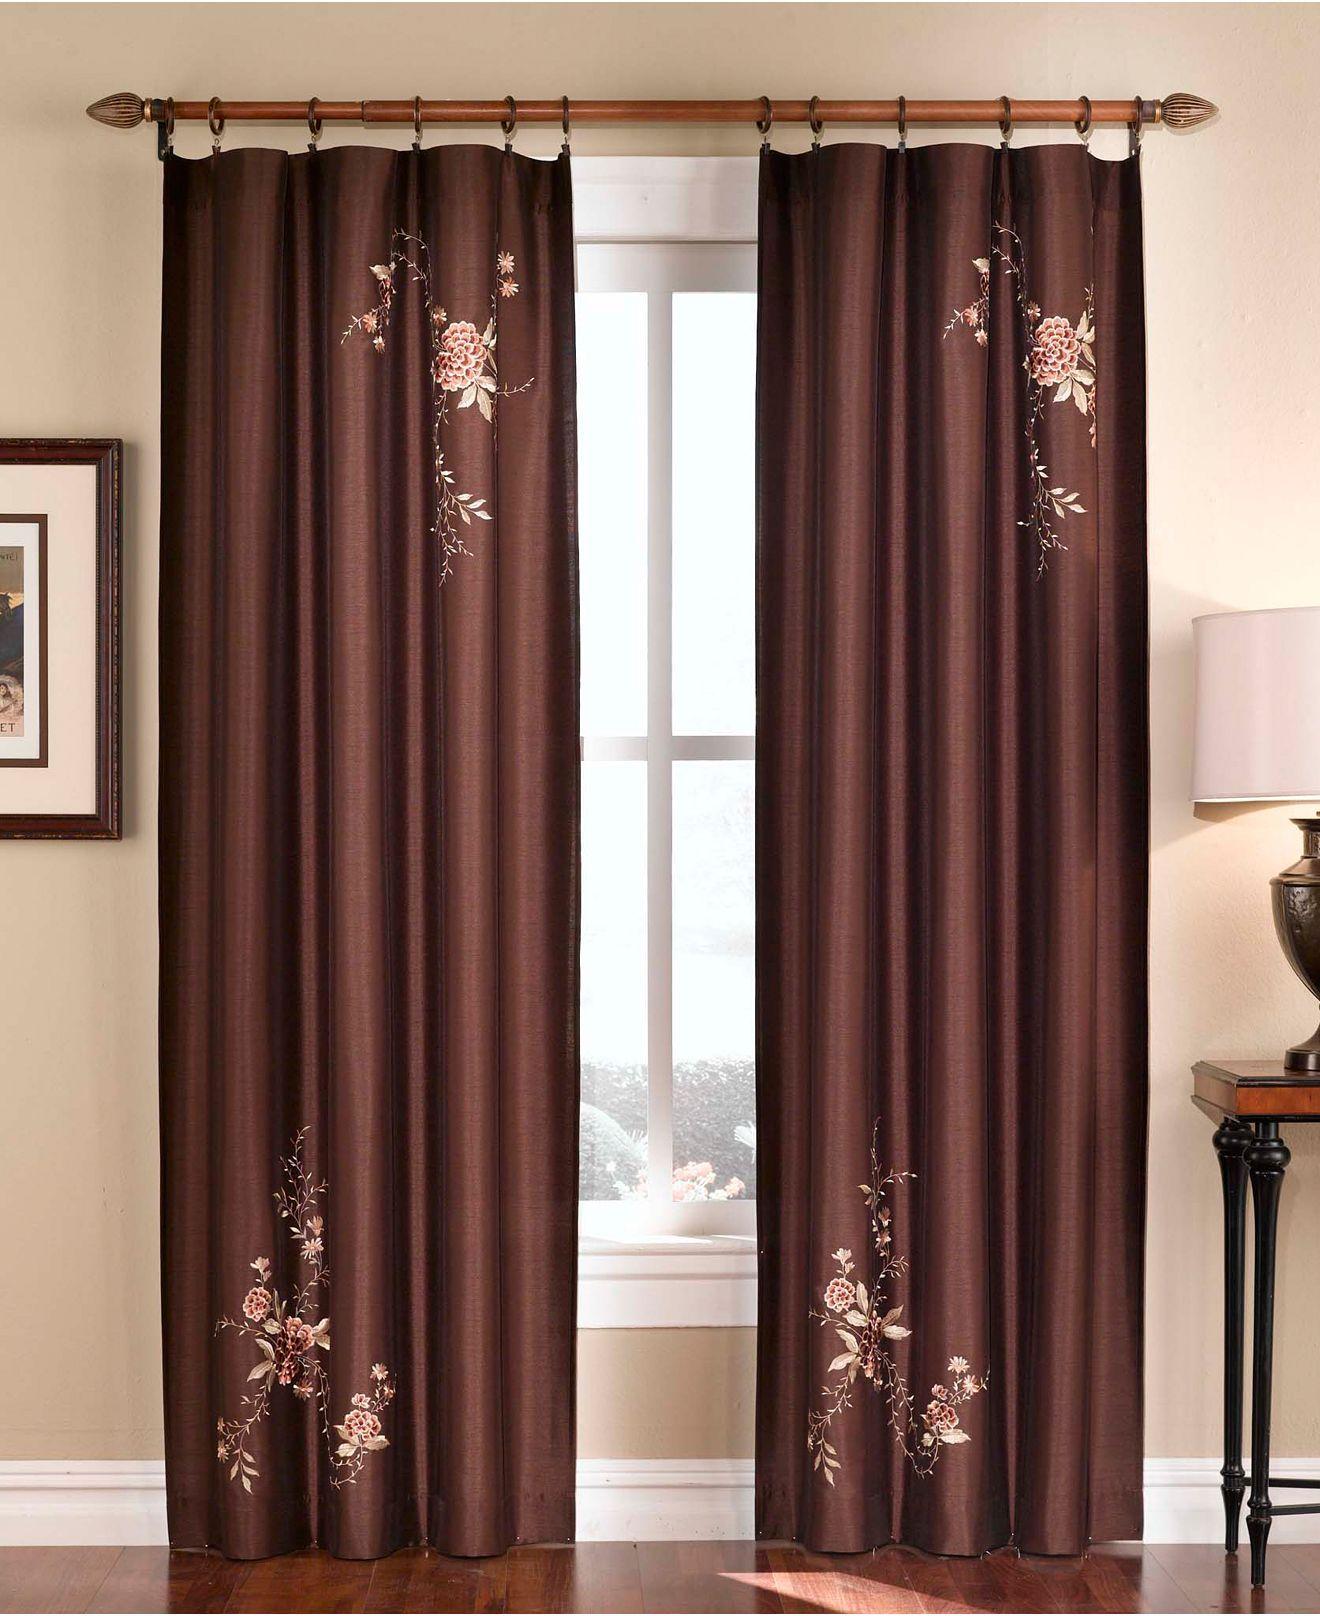 Chf peri alessandra window treatment collection window drapes